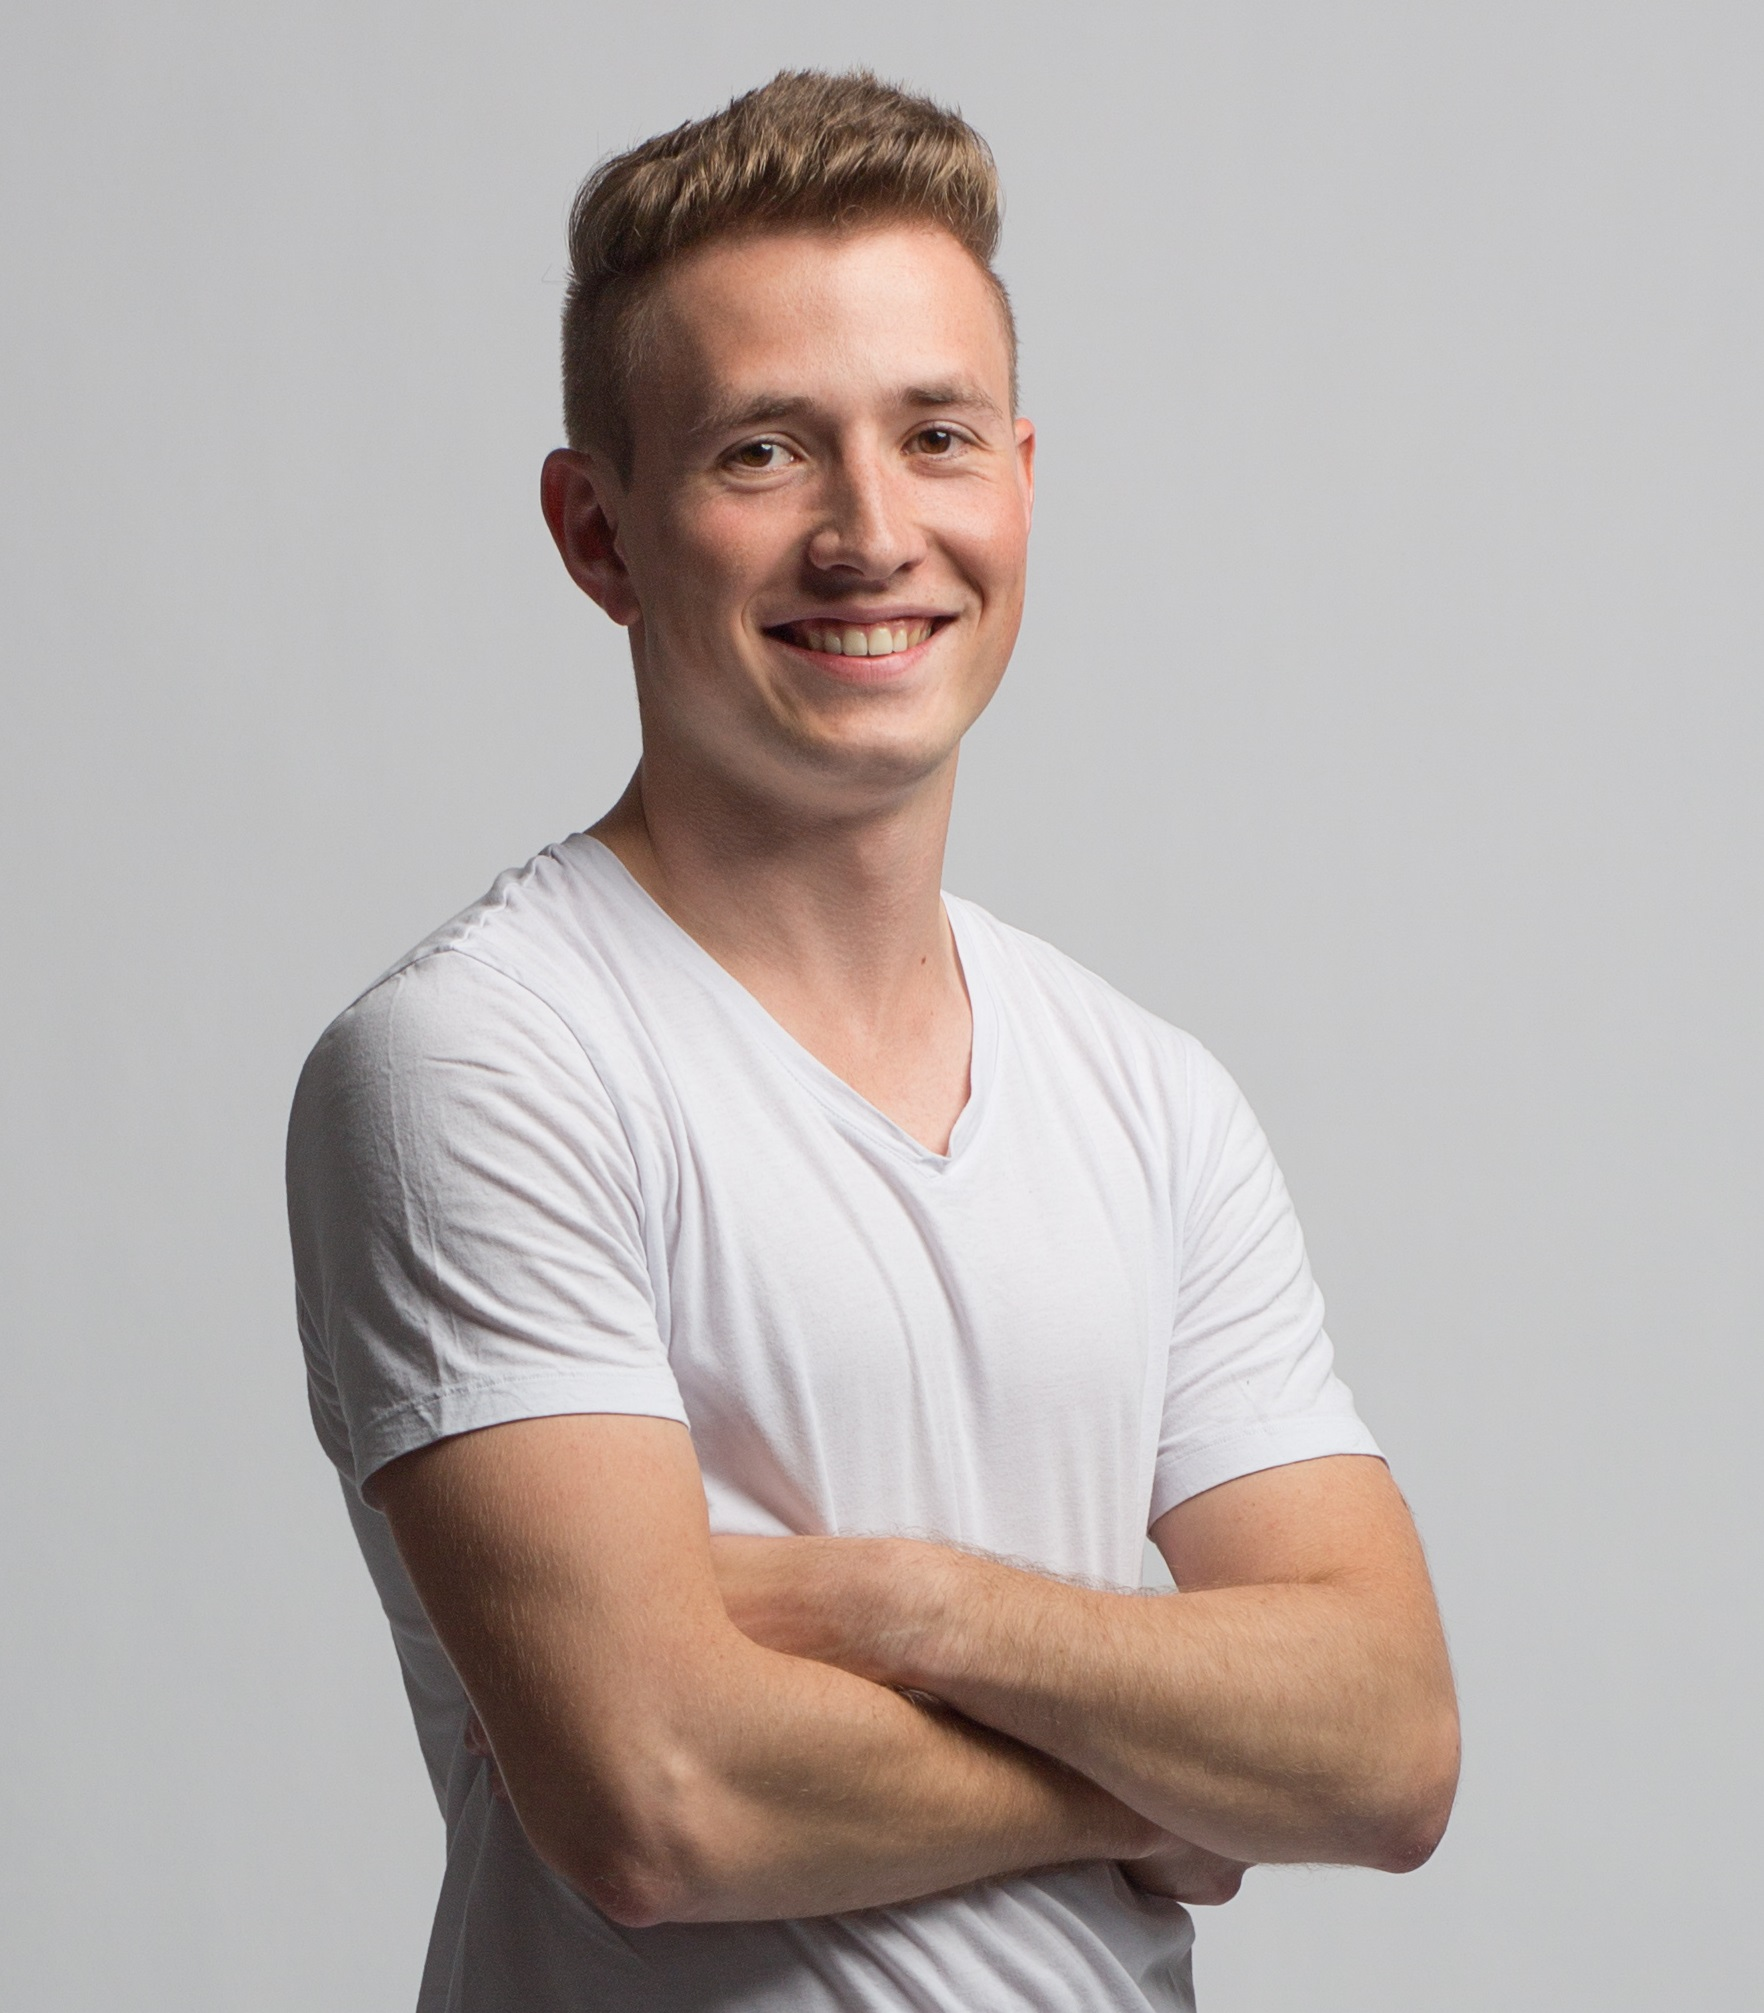 SEO-Experte Matthias Ebert